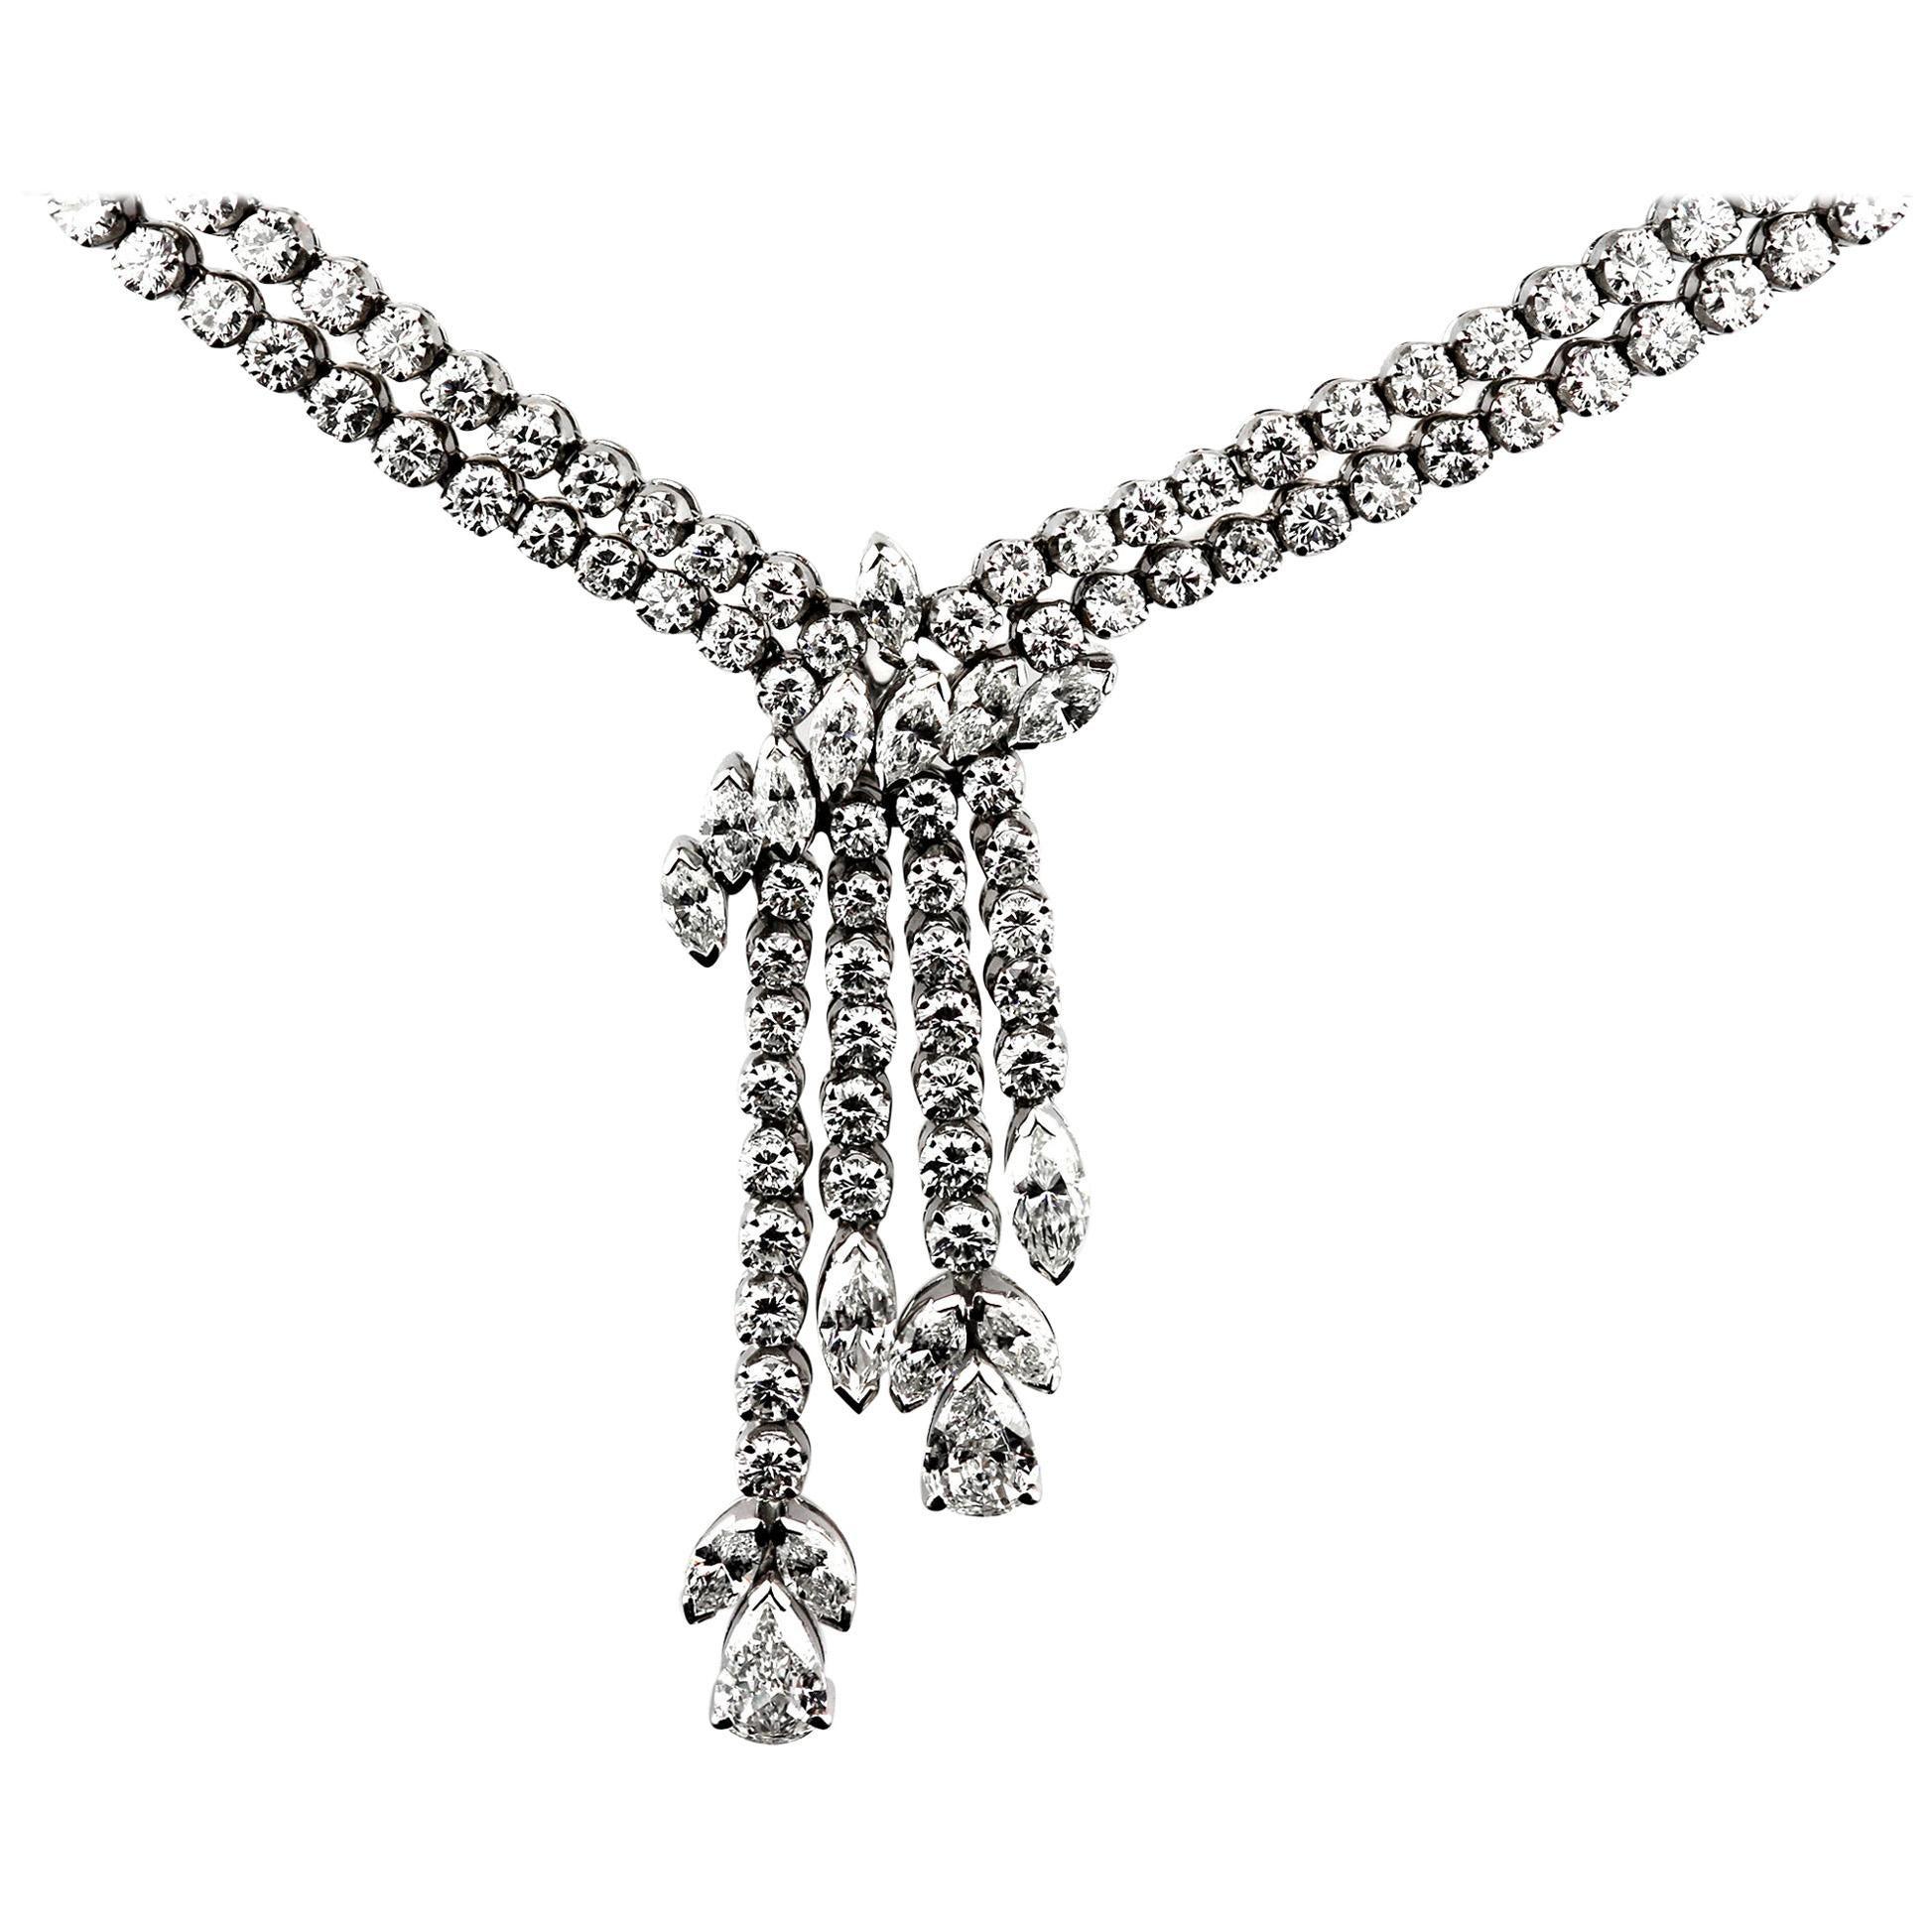 Diamond Drop Necklace/Headpiece, in 18K White Gold